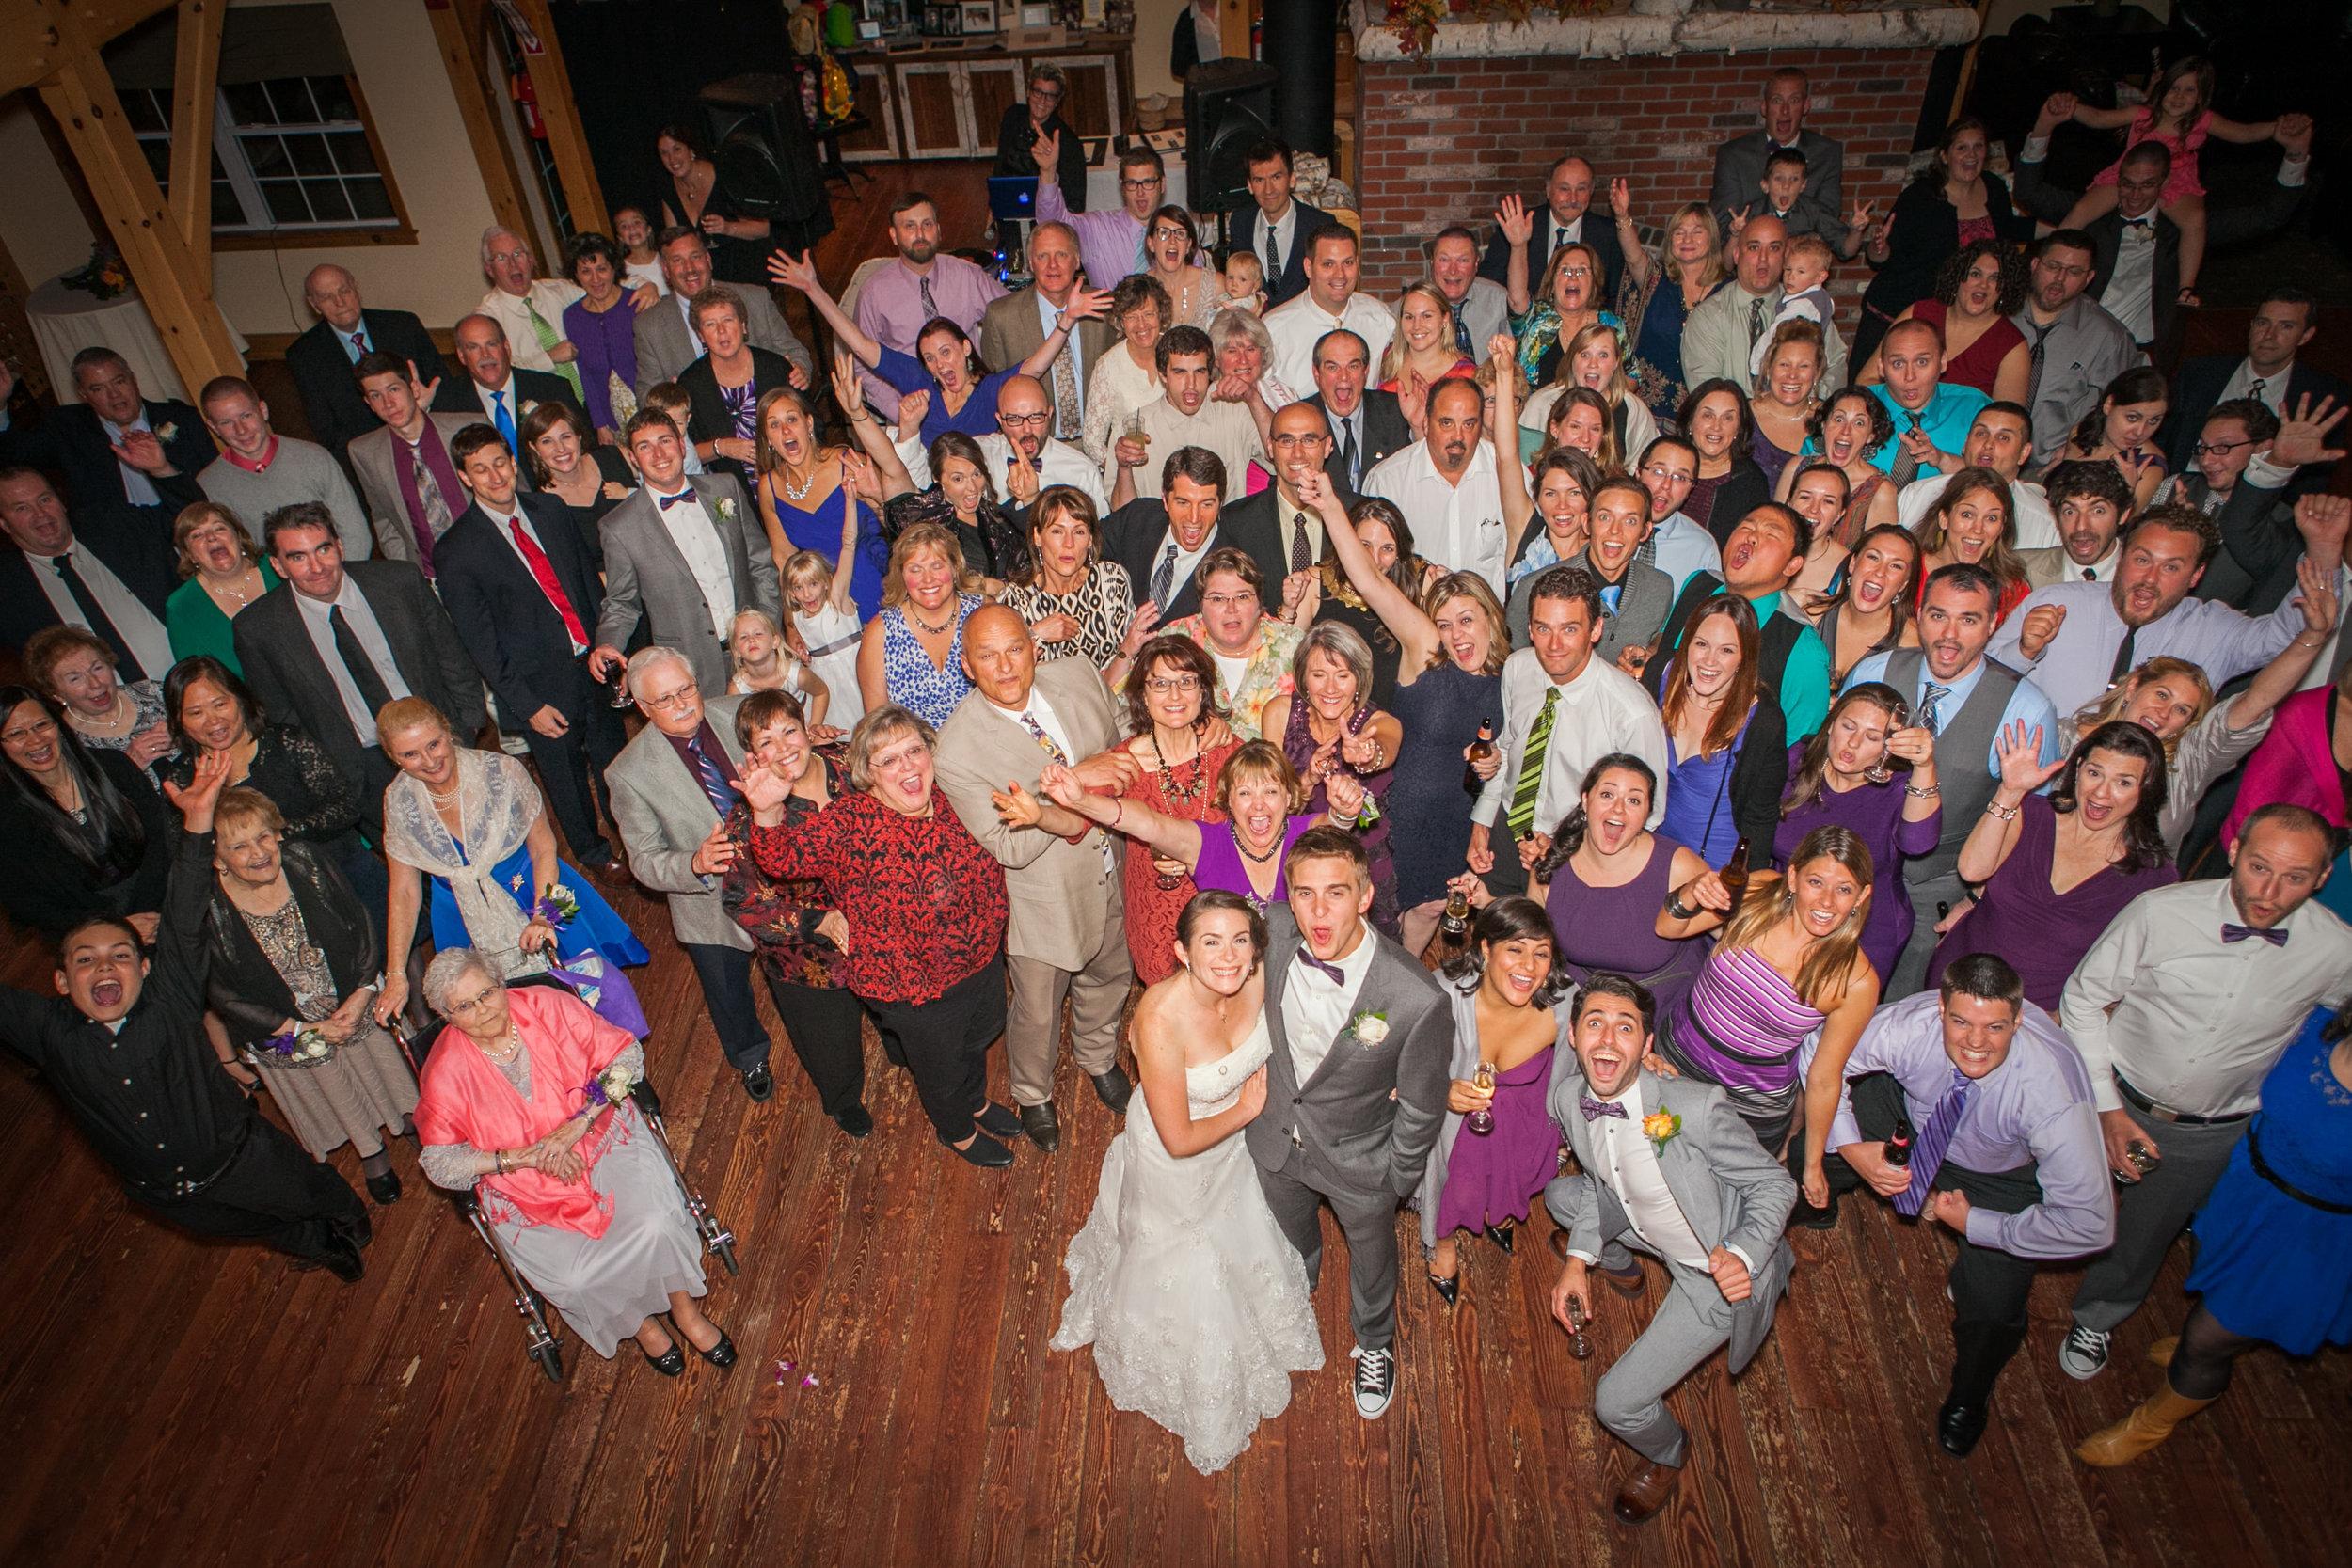 zorvino_sandown_NH_wedding_photography-65.jpg